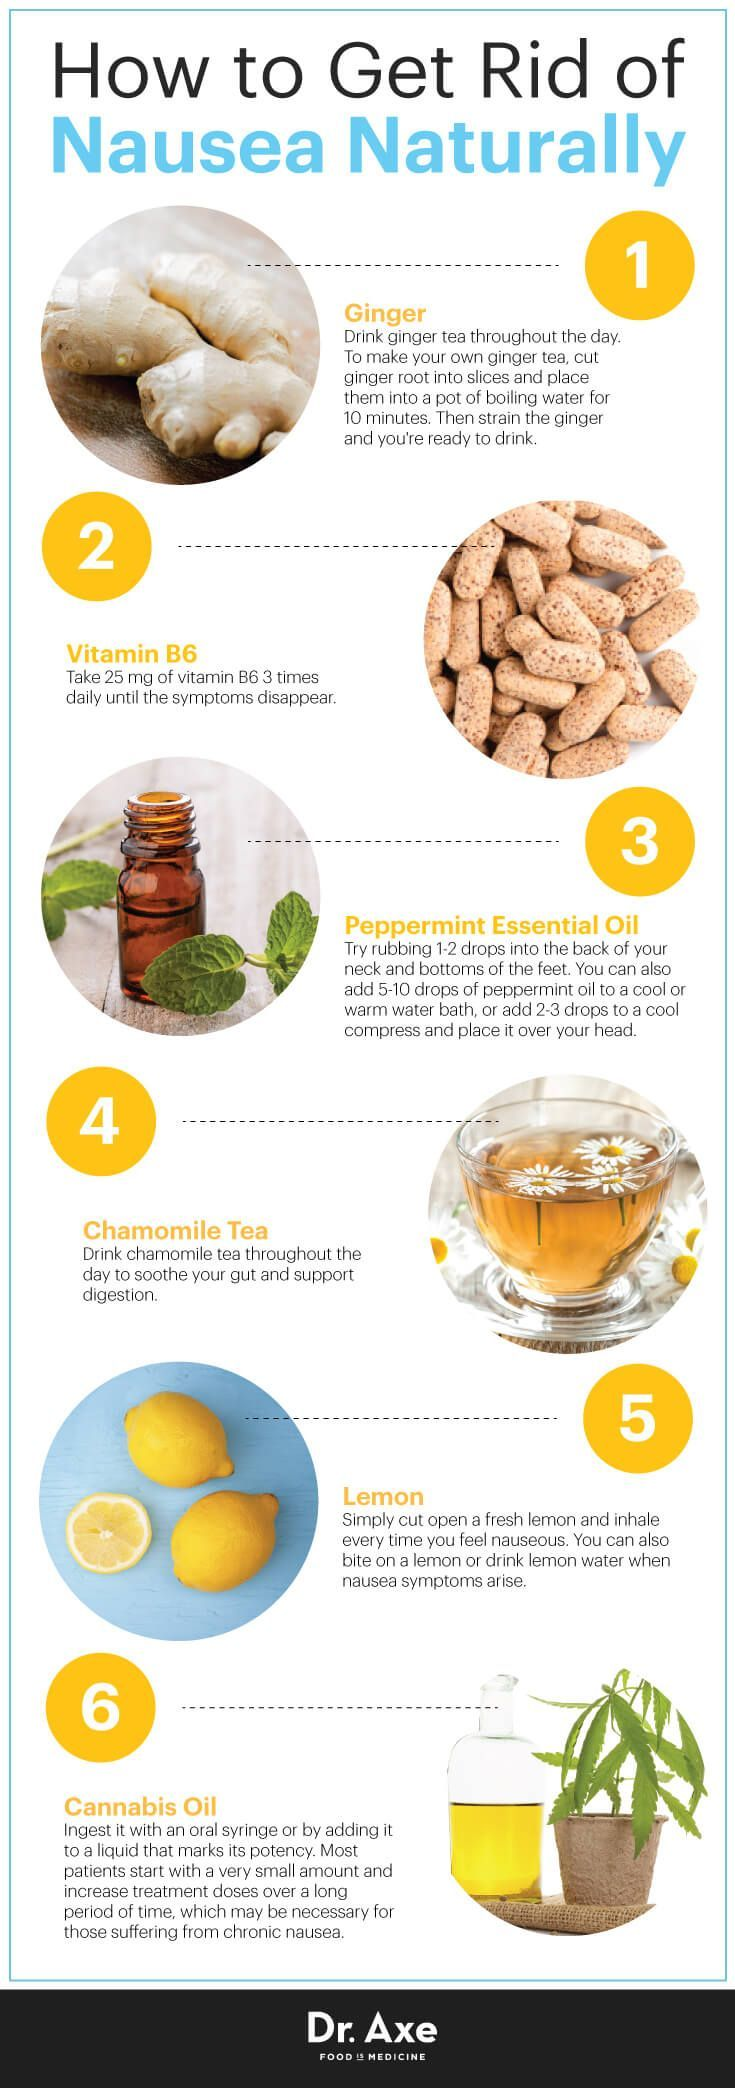 Best Way To Get Rid Of Headache Naturally